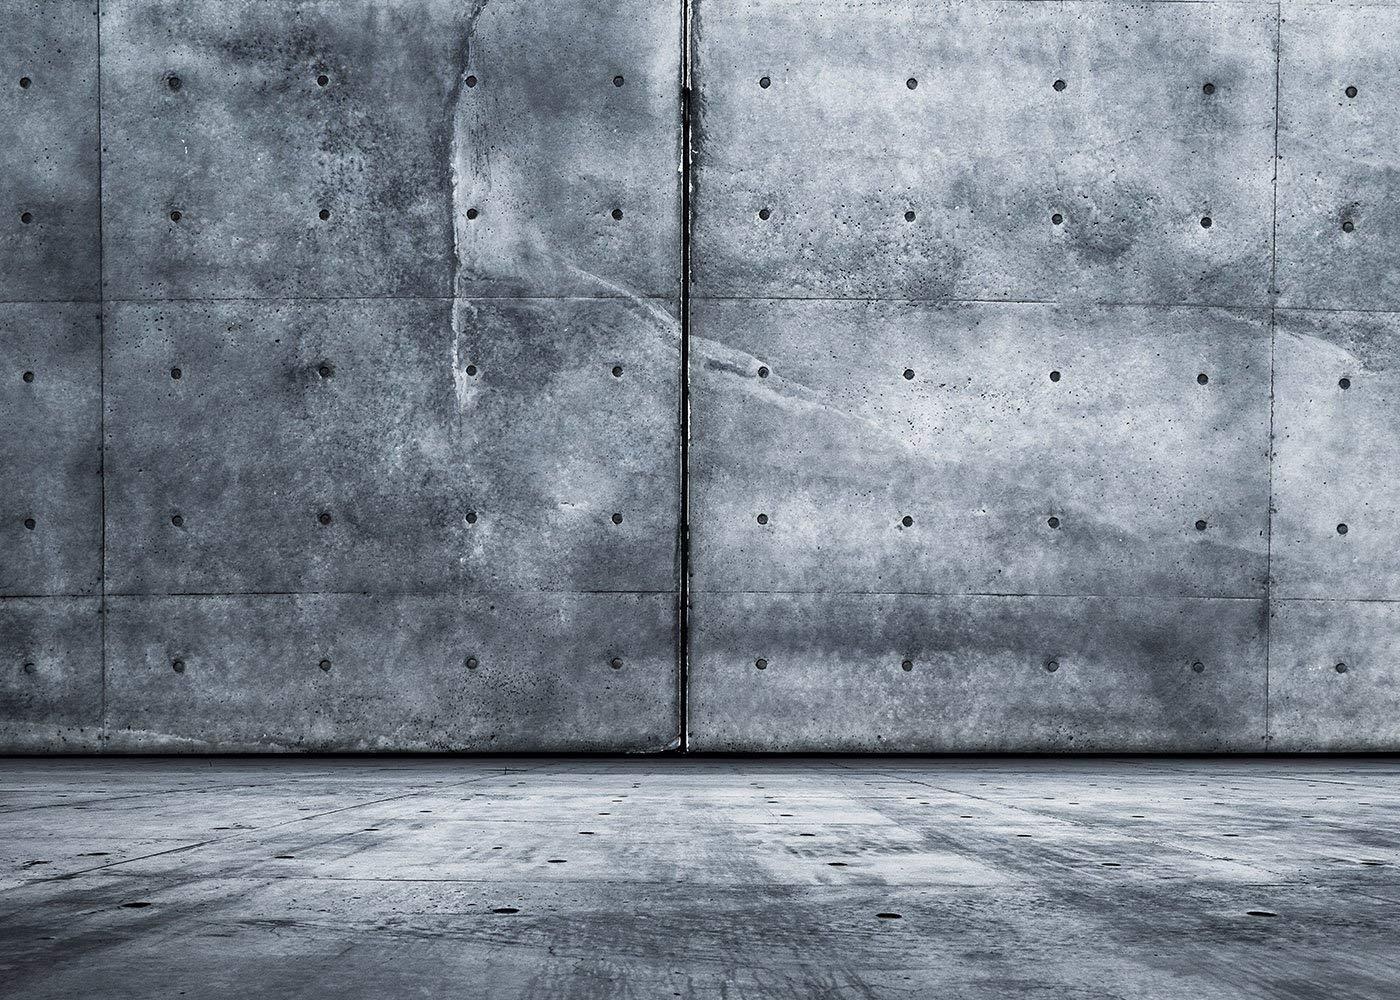 Image 4 - 5x7ft большой голубой камень фон для фотосъемки холст фотостудия реквизит стена-in Аксессуары для фотостудии from Бытовая электроника on AliExpress - 11.11_Double 11_Singles' Day